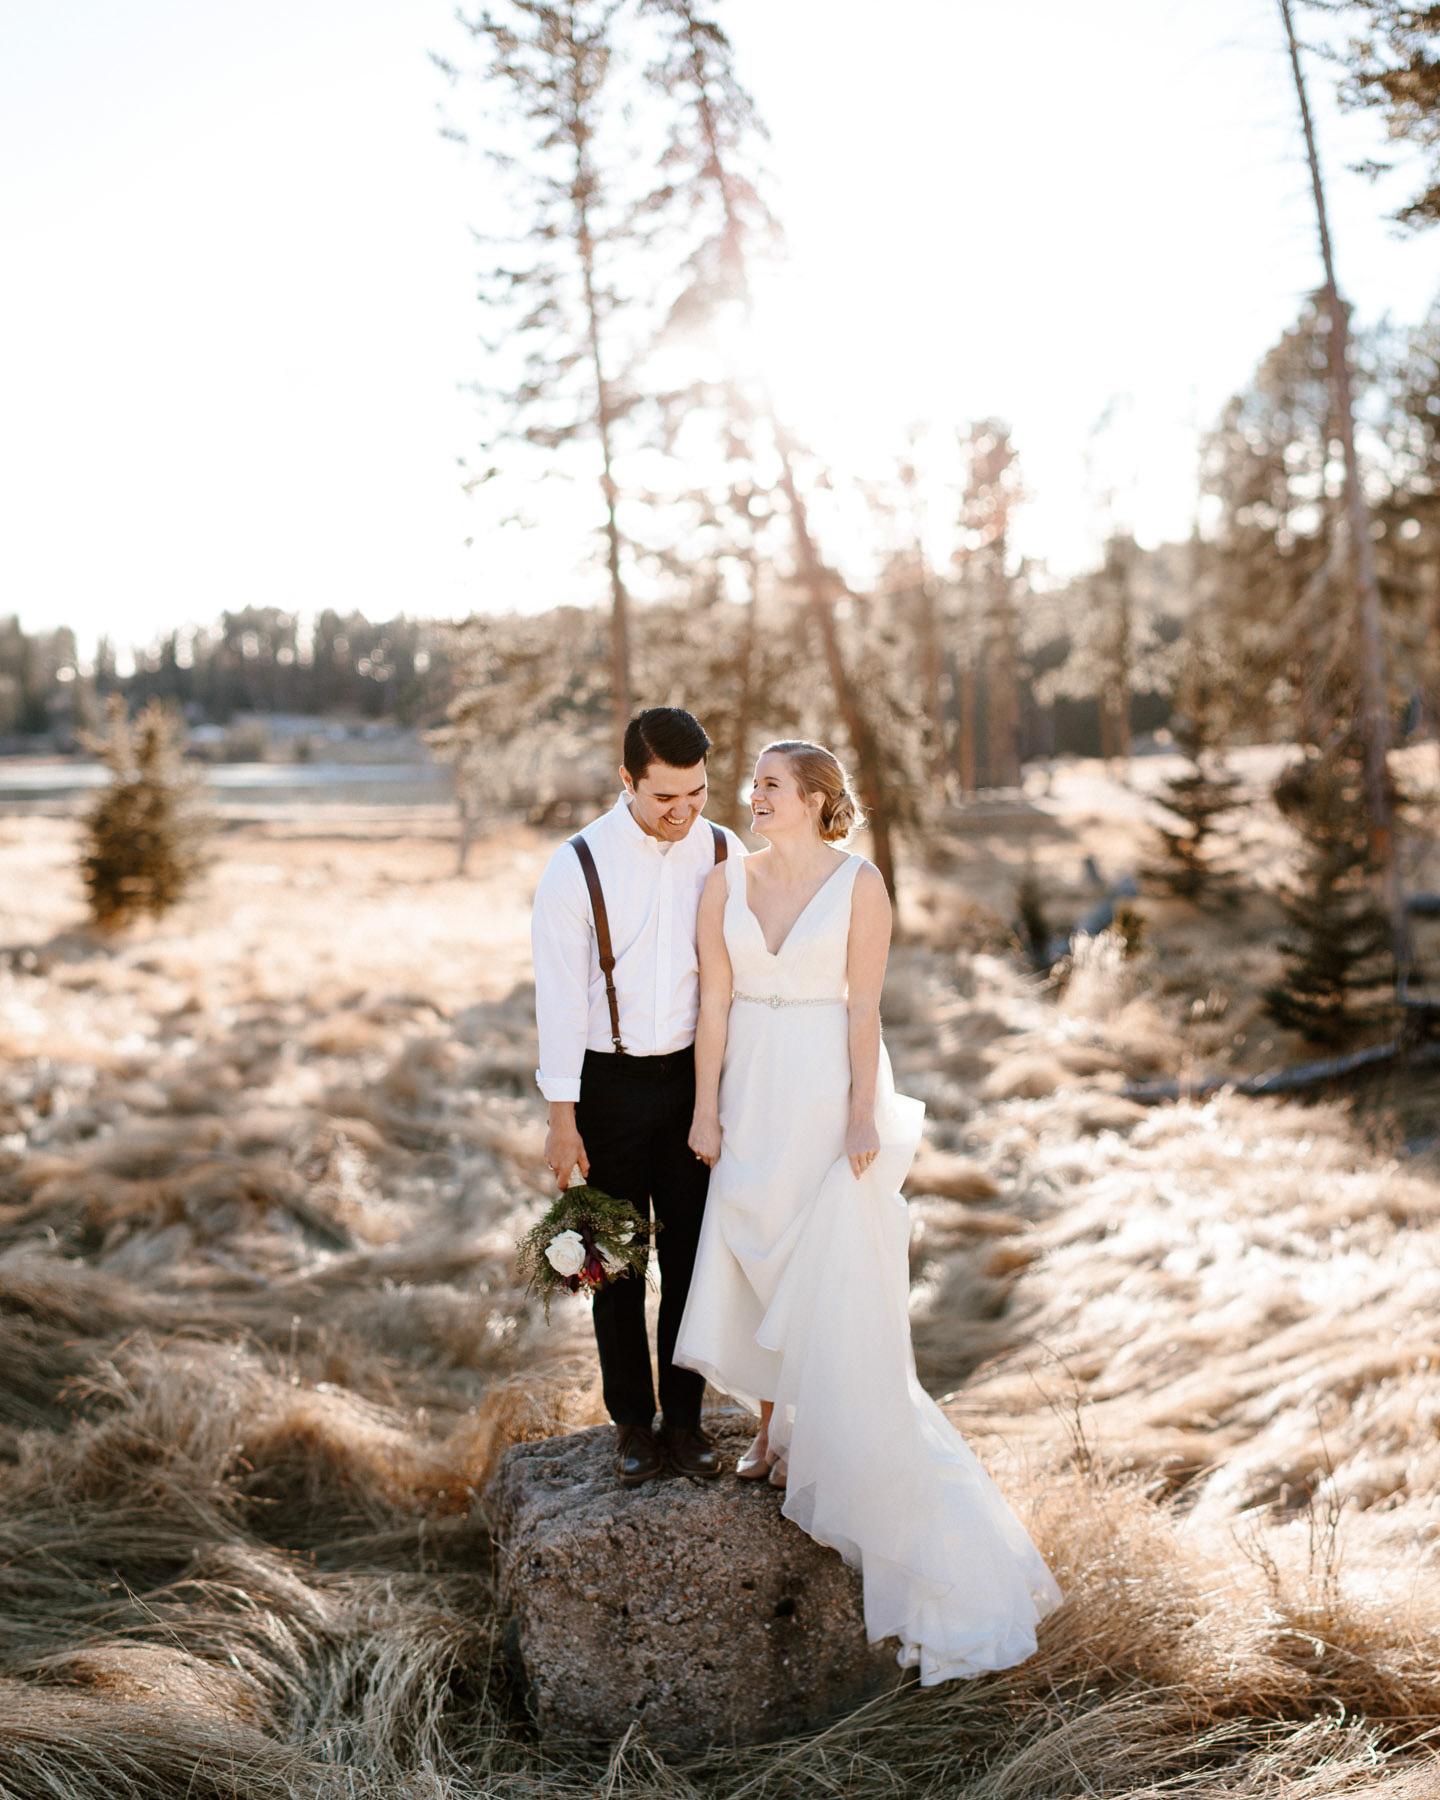 sioux-falls-black-hills-rapid-city-elopement-wedding-adventure-photographer-custer-sylvan-lake-19.jpg